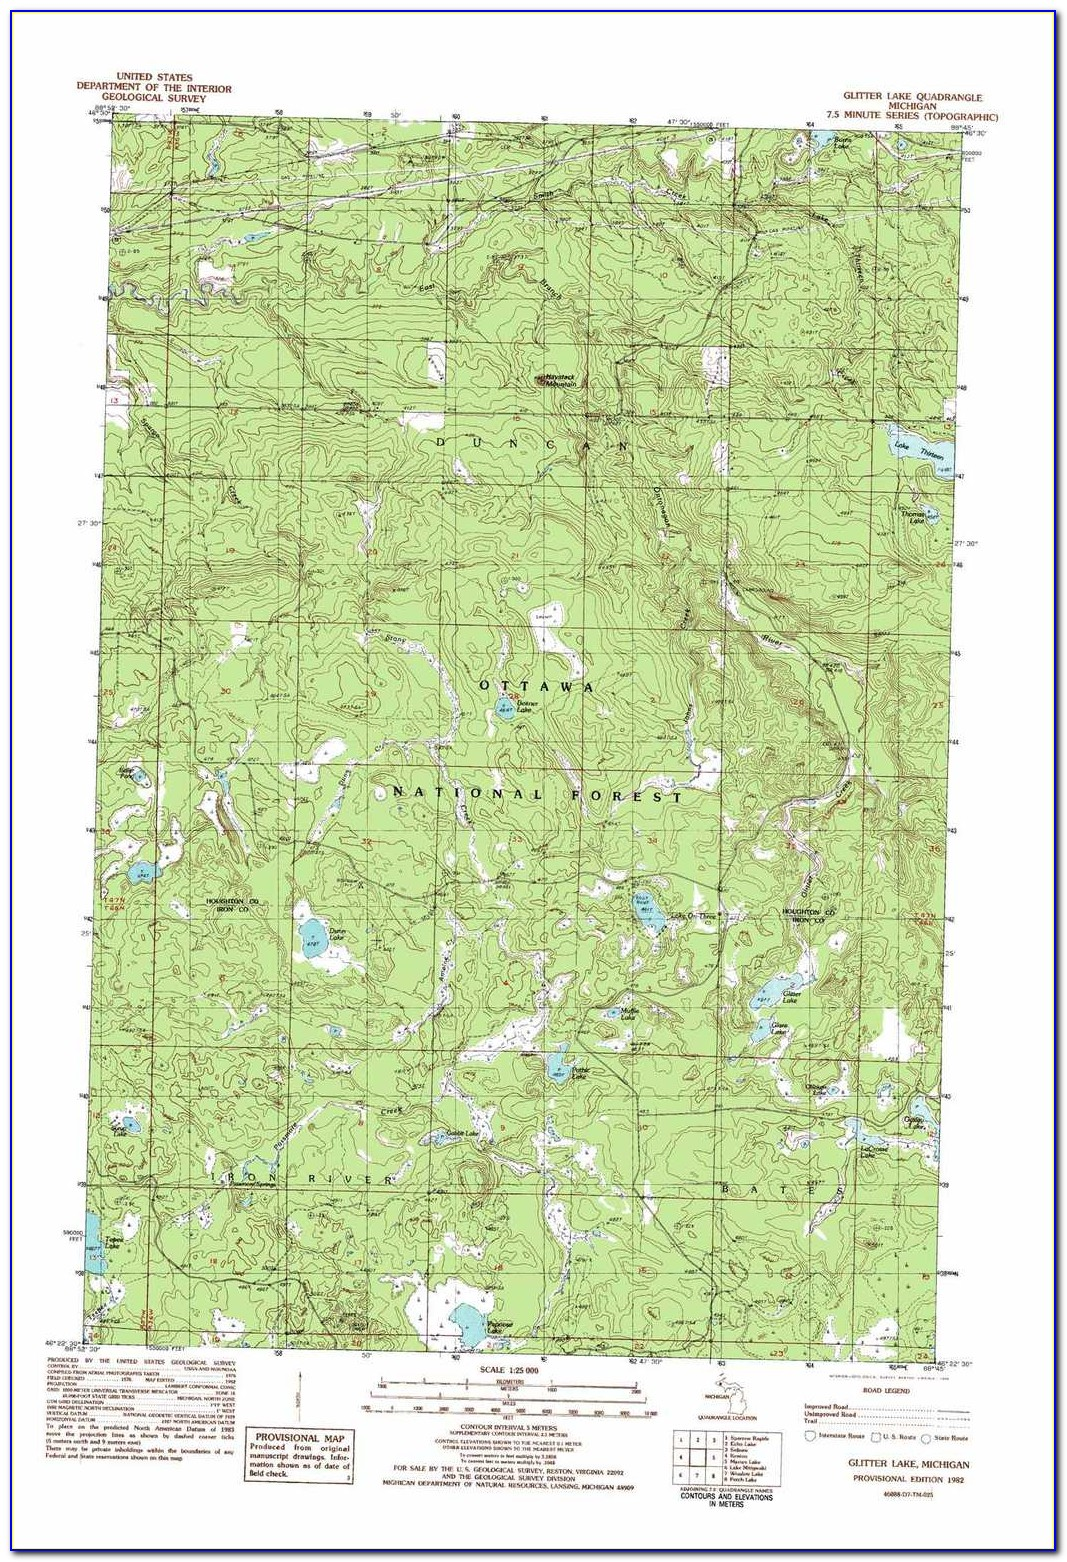 Union Lake Mi Topographic Map